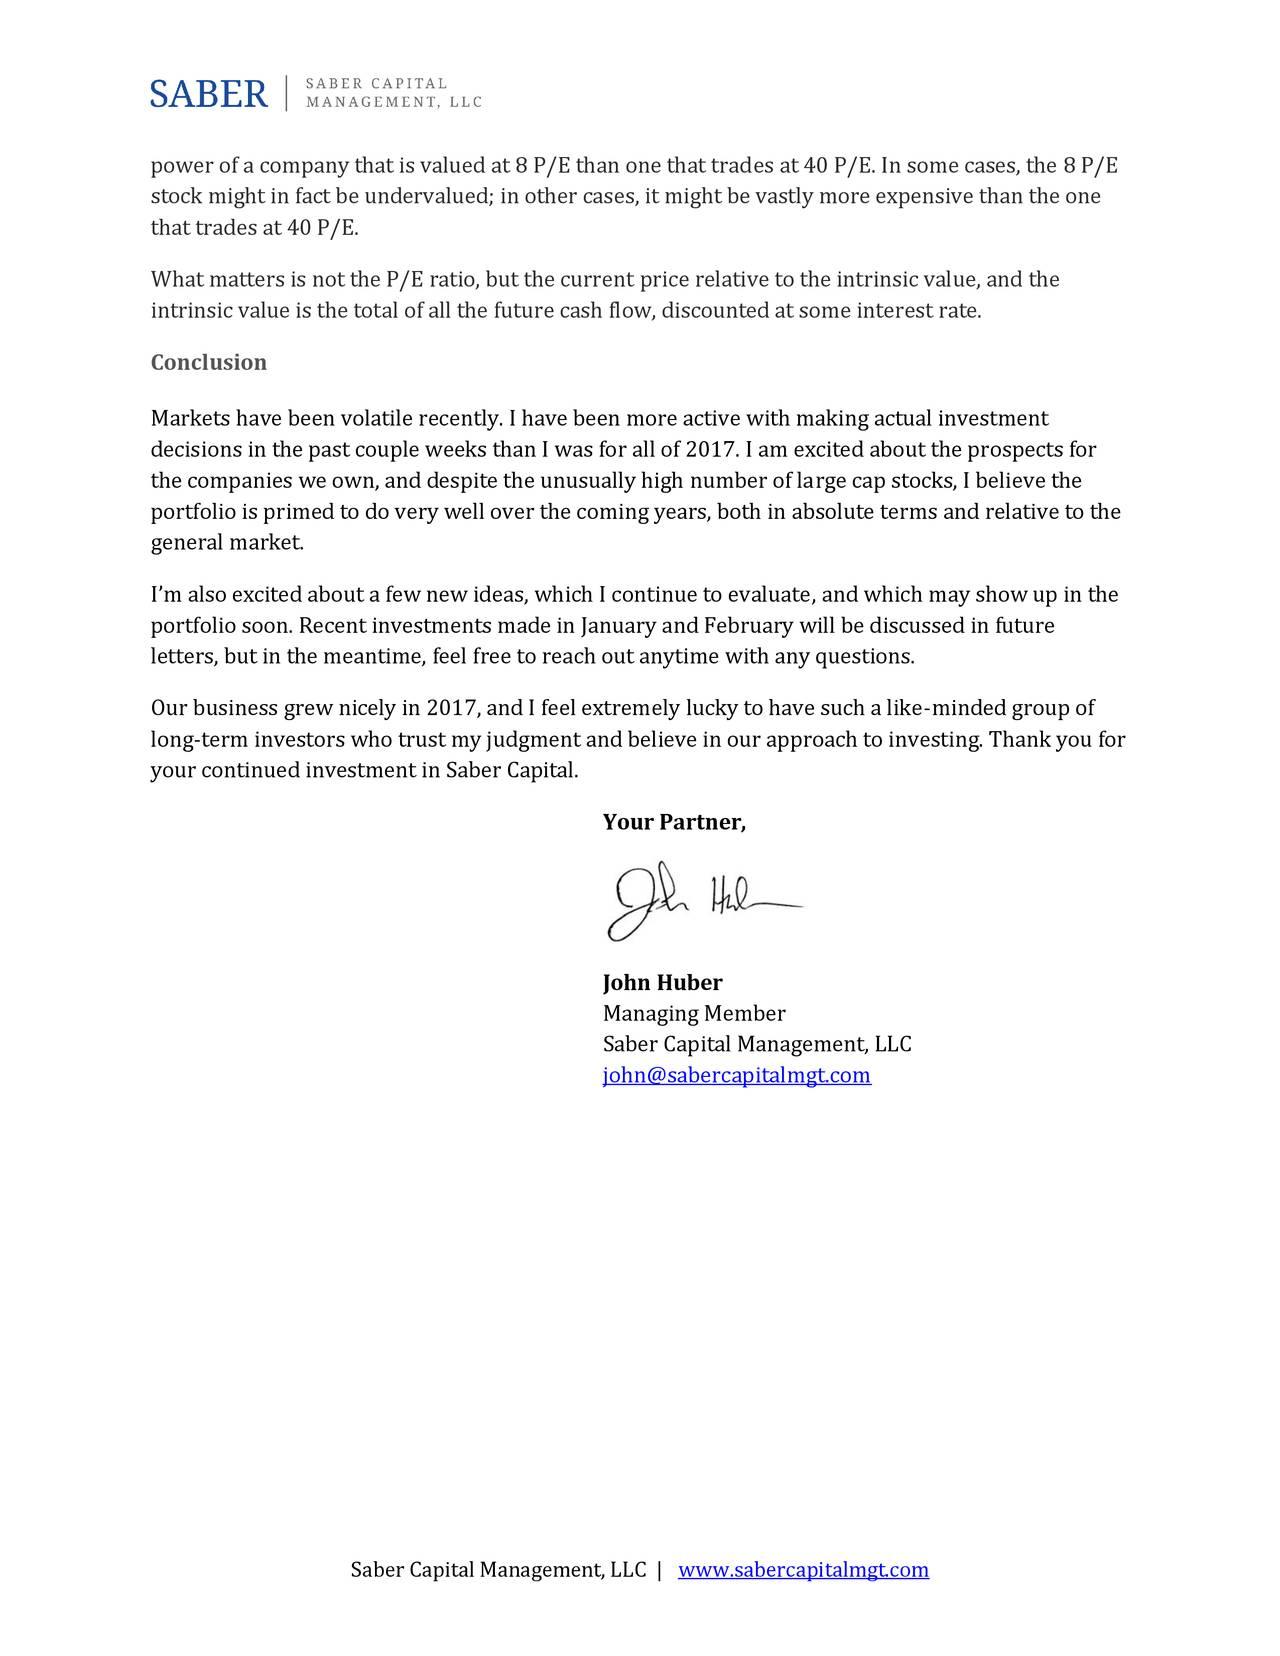 saber capital management letter to investors 2017 review apple